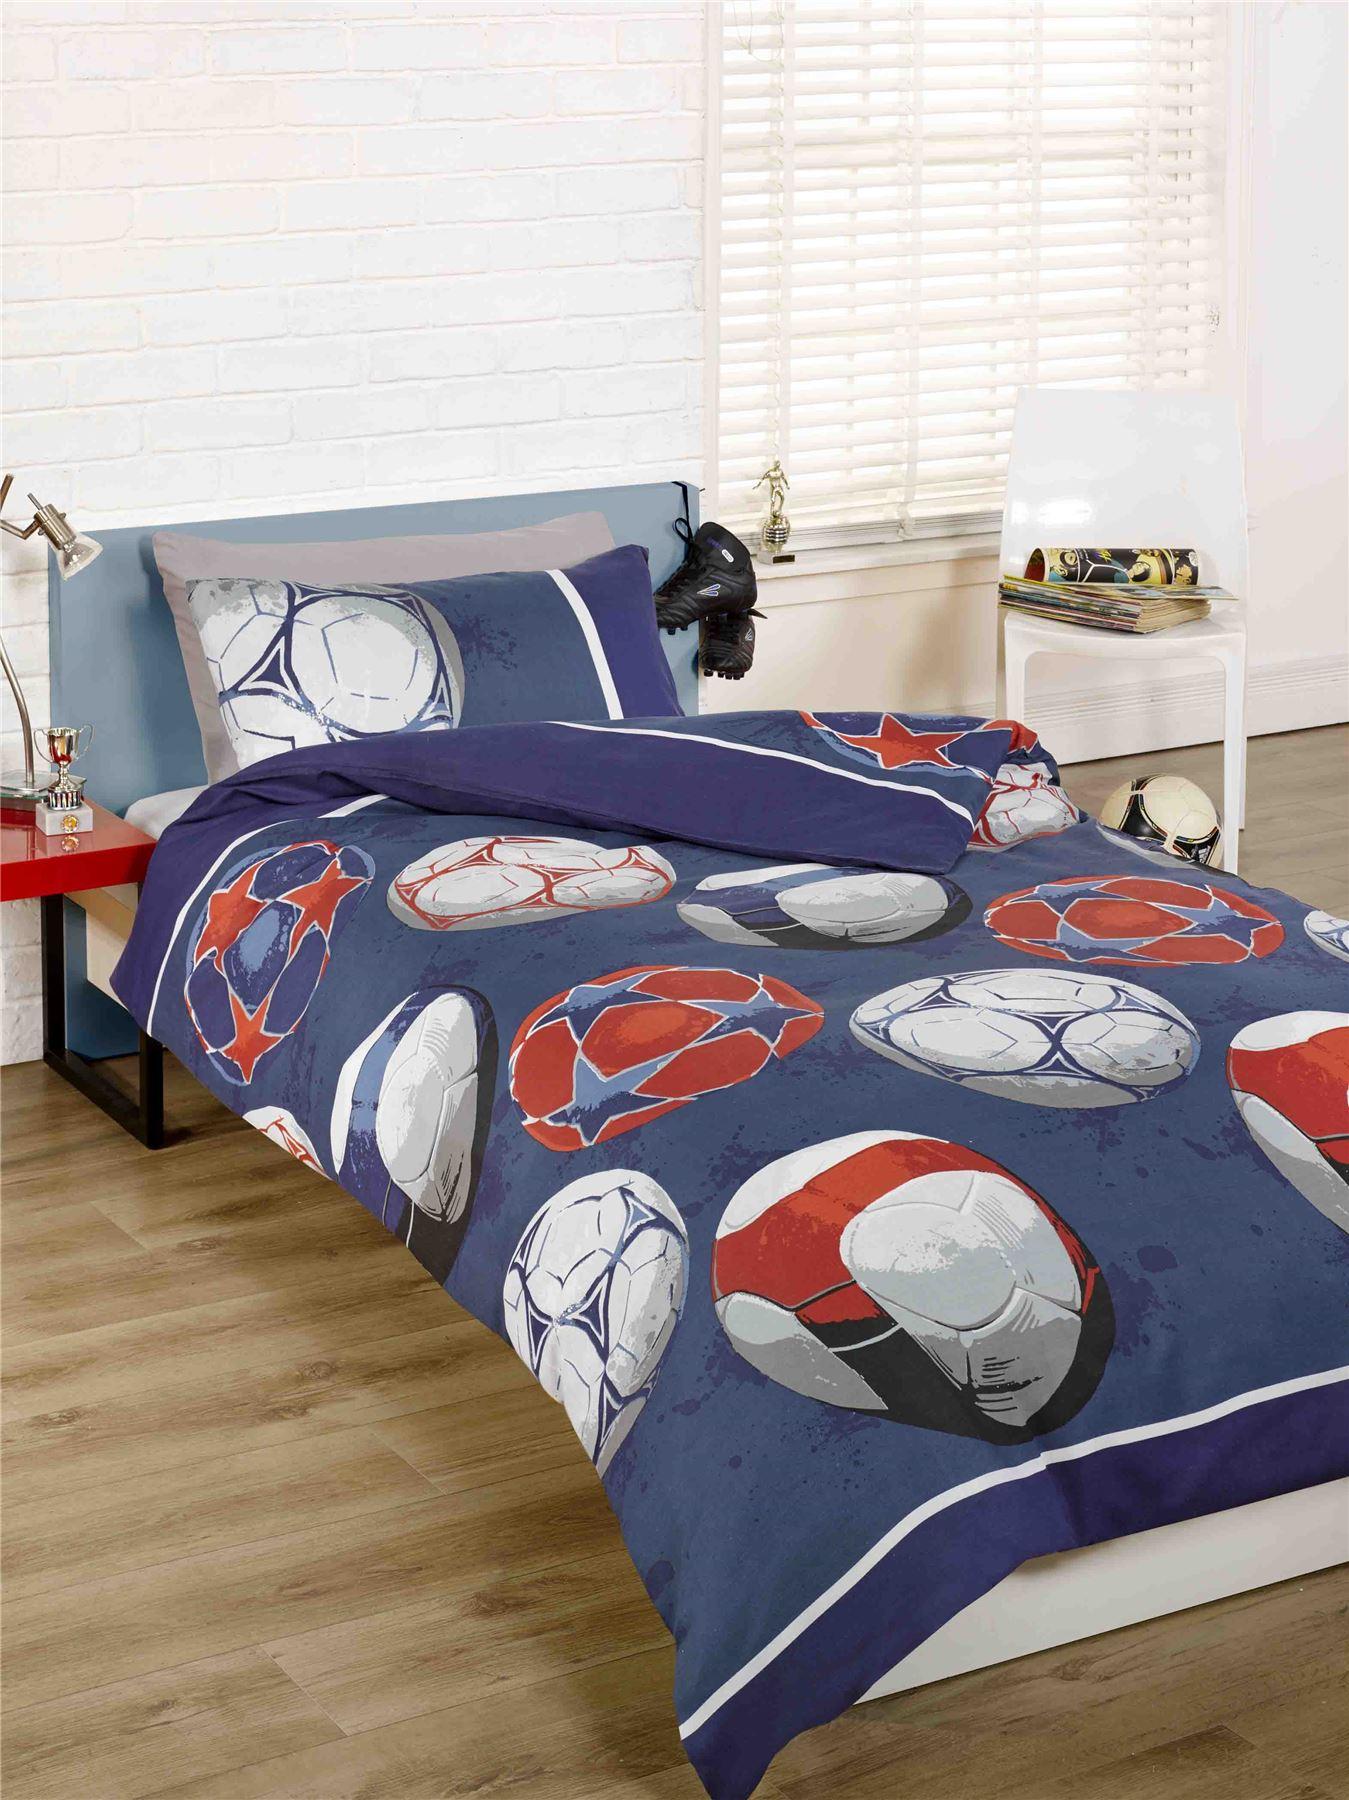 rapport kidz ropa de cama f tbol para ni os juego de. Black Bedroom Furniture Sets. Home Design Ideas